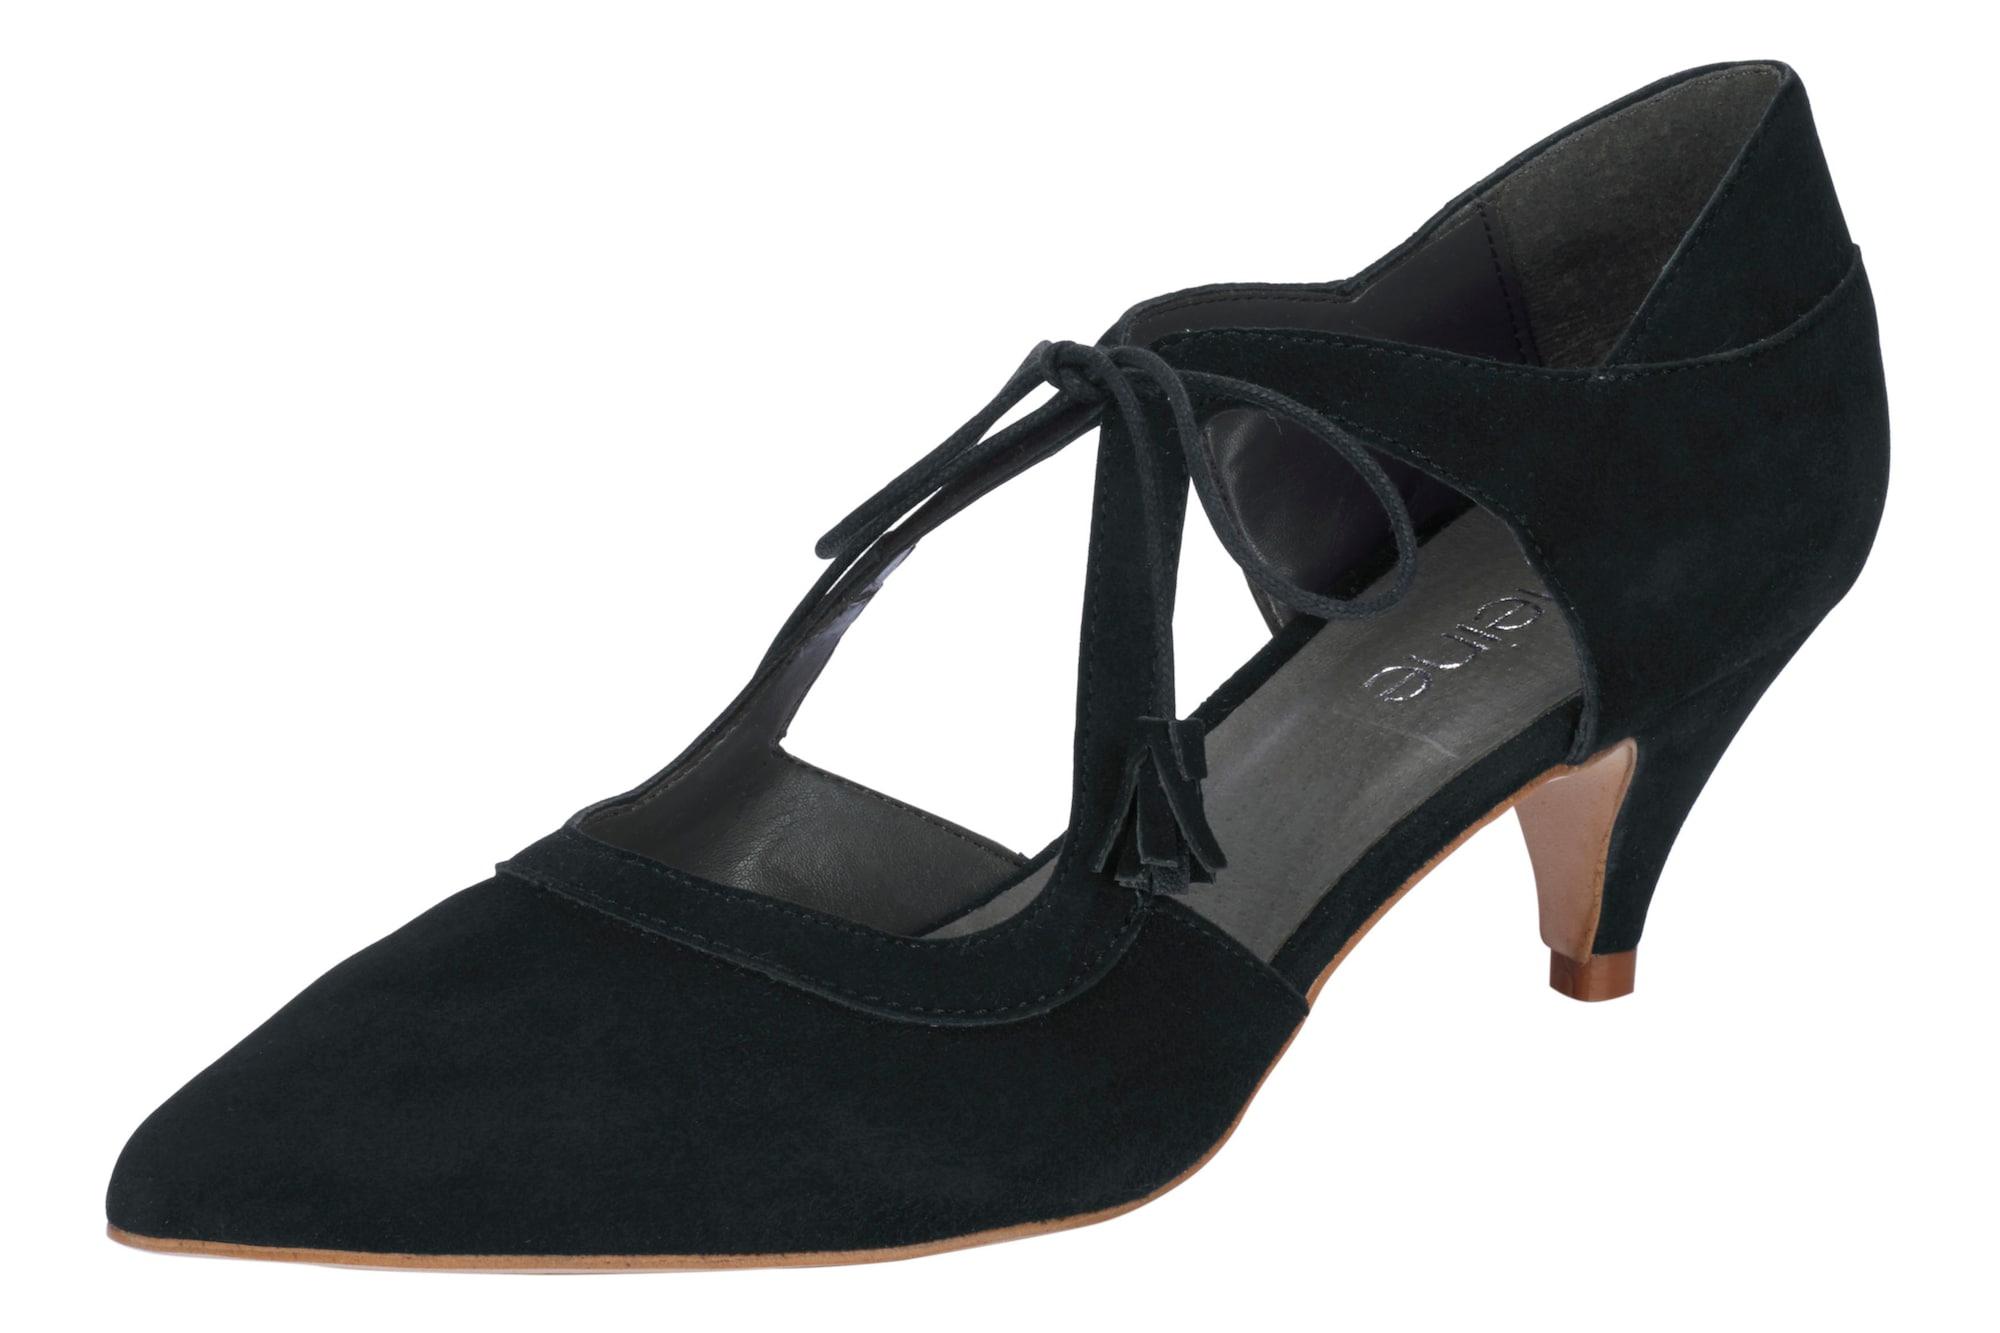 Schnürpumps | Schuhe > Pumps > Schnürpumps | Schwarz | heine